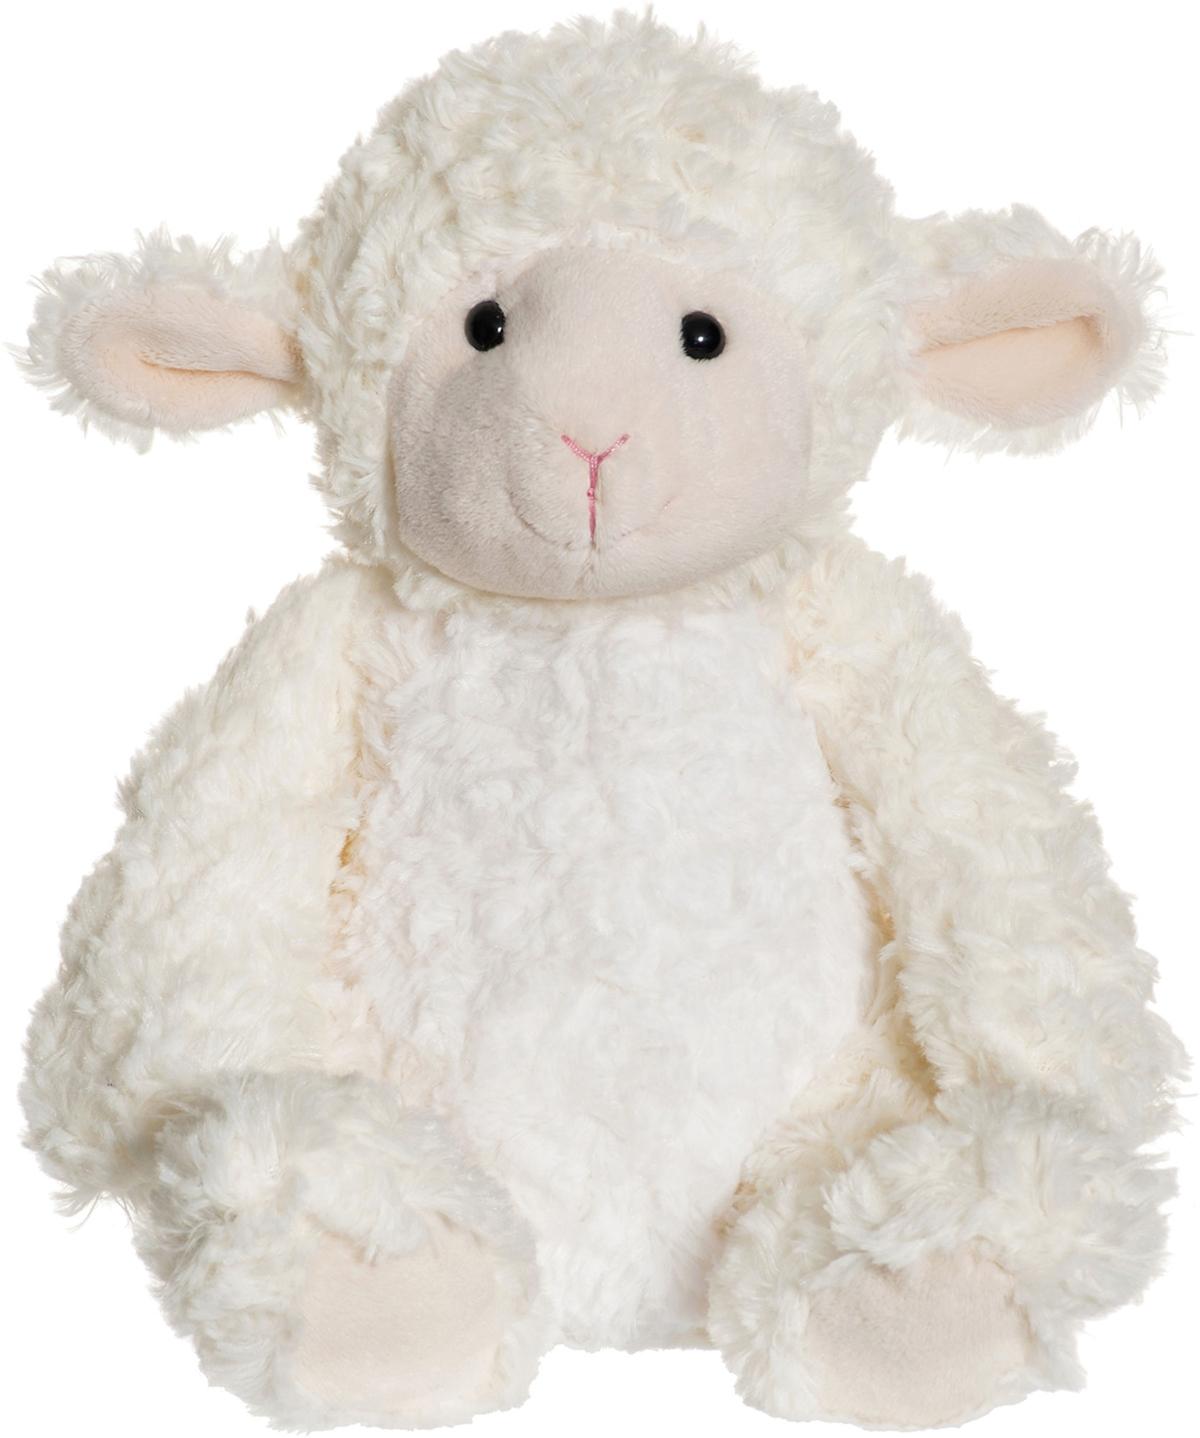 Softies Lammet Lilly, 28cm - Teddykompaniet